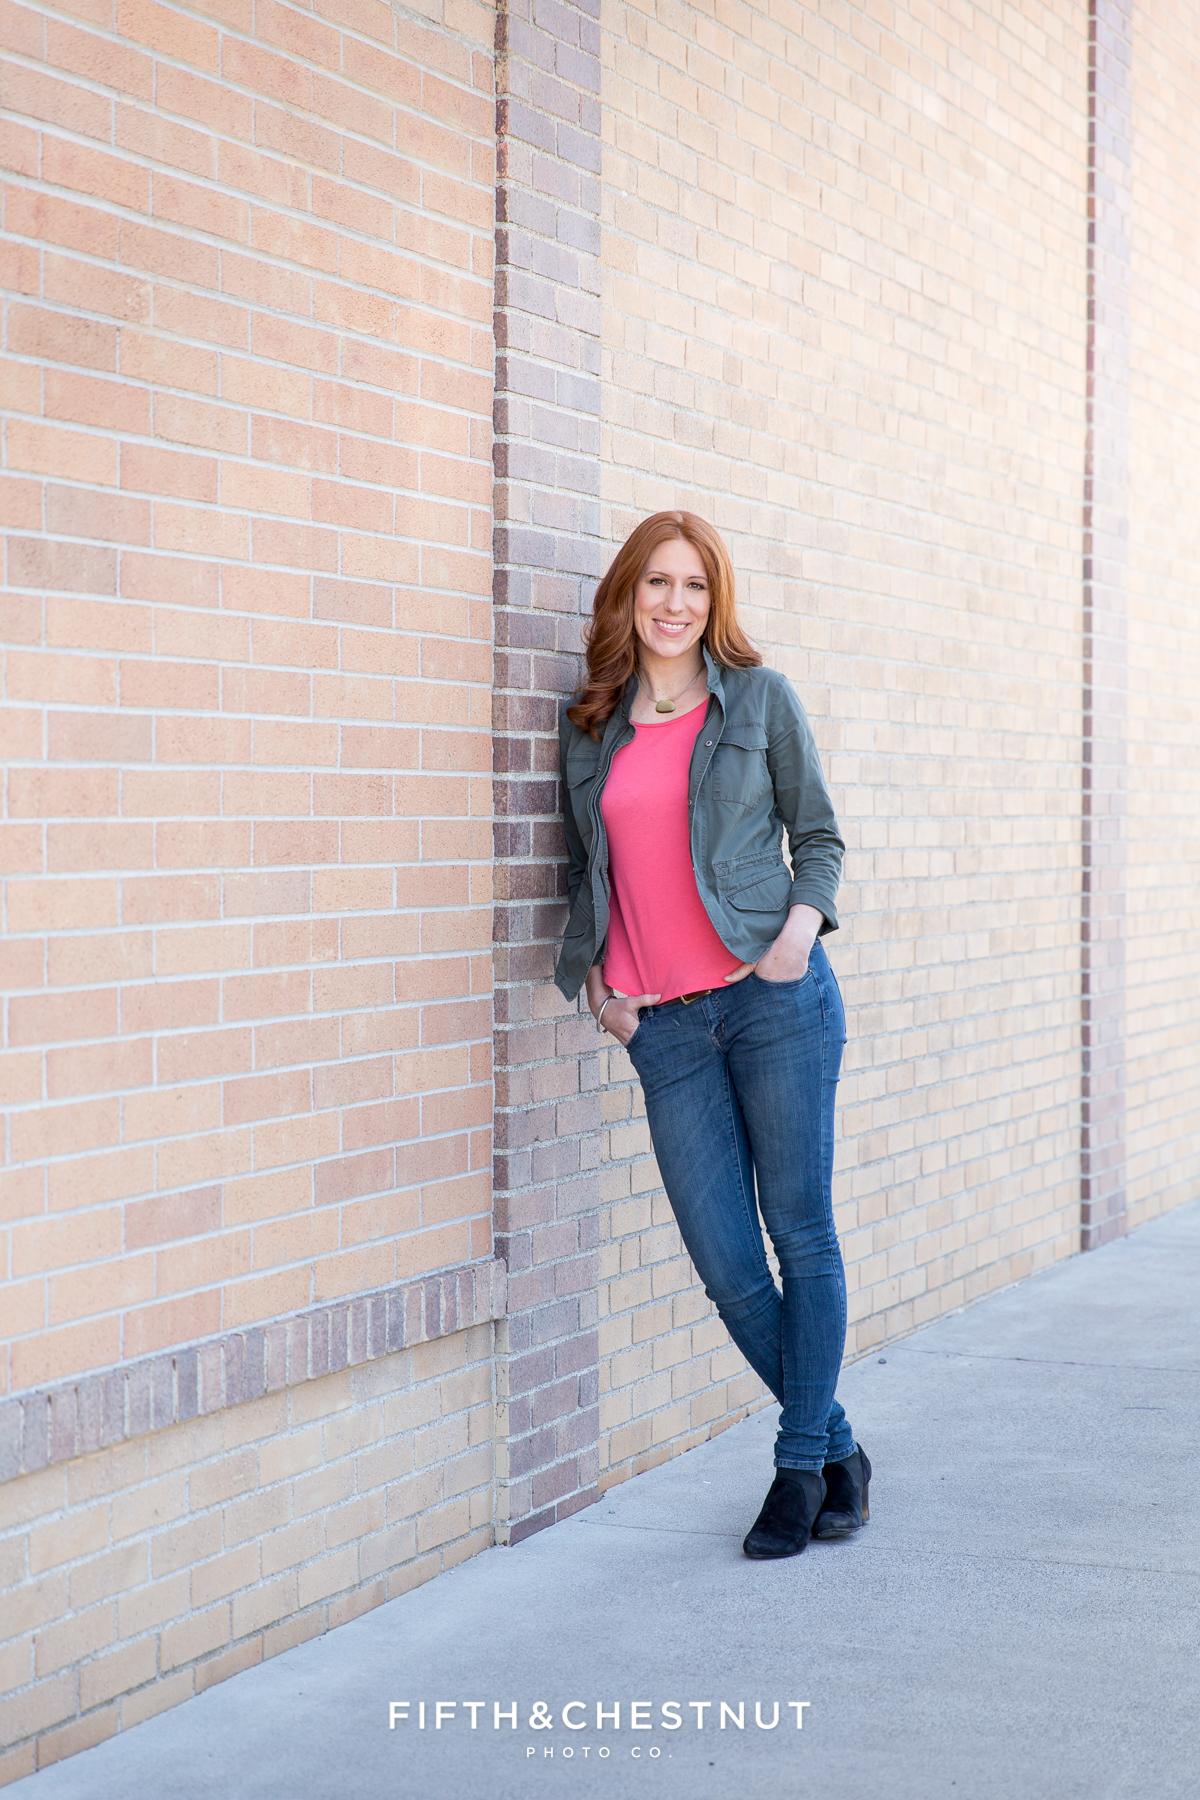 Headshots of Amber Barnes by Reno Headshot Photographer